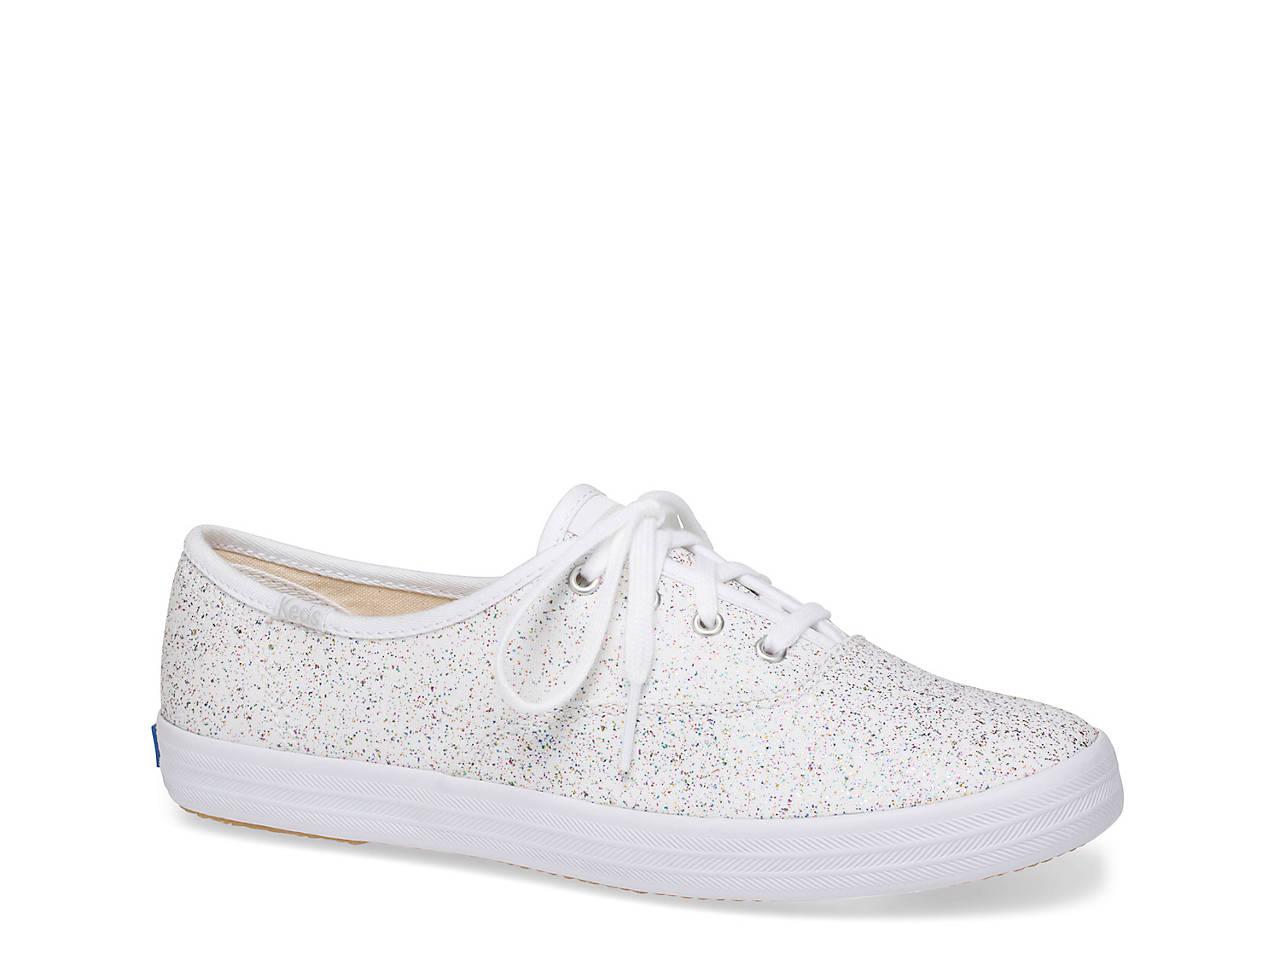 f7dc0409e5a Keds Champion Starlight Sneaker - Women s Women s Shoes